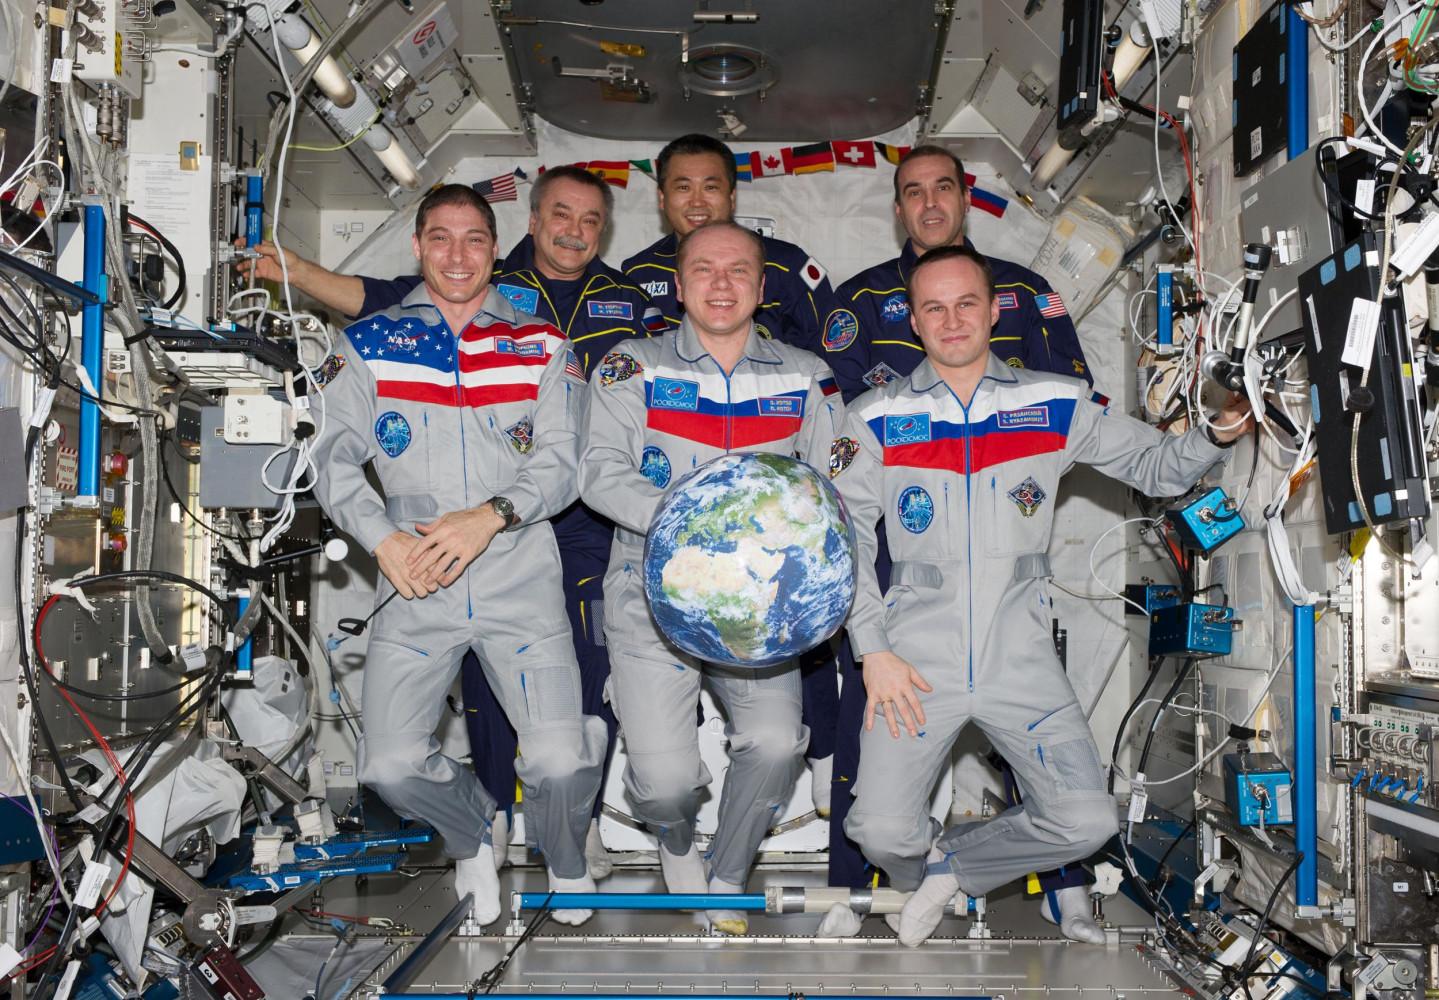 usa nasa astronauts - photo #22